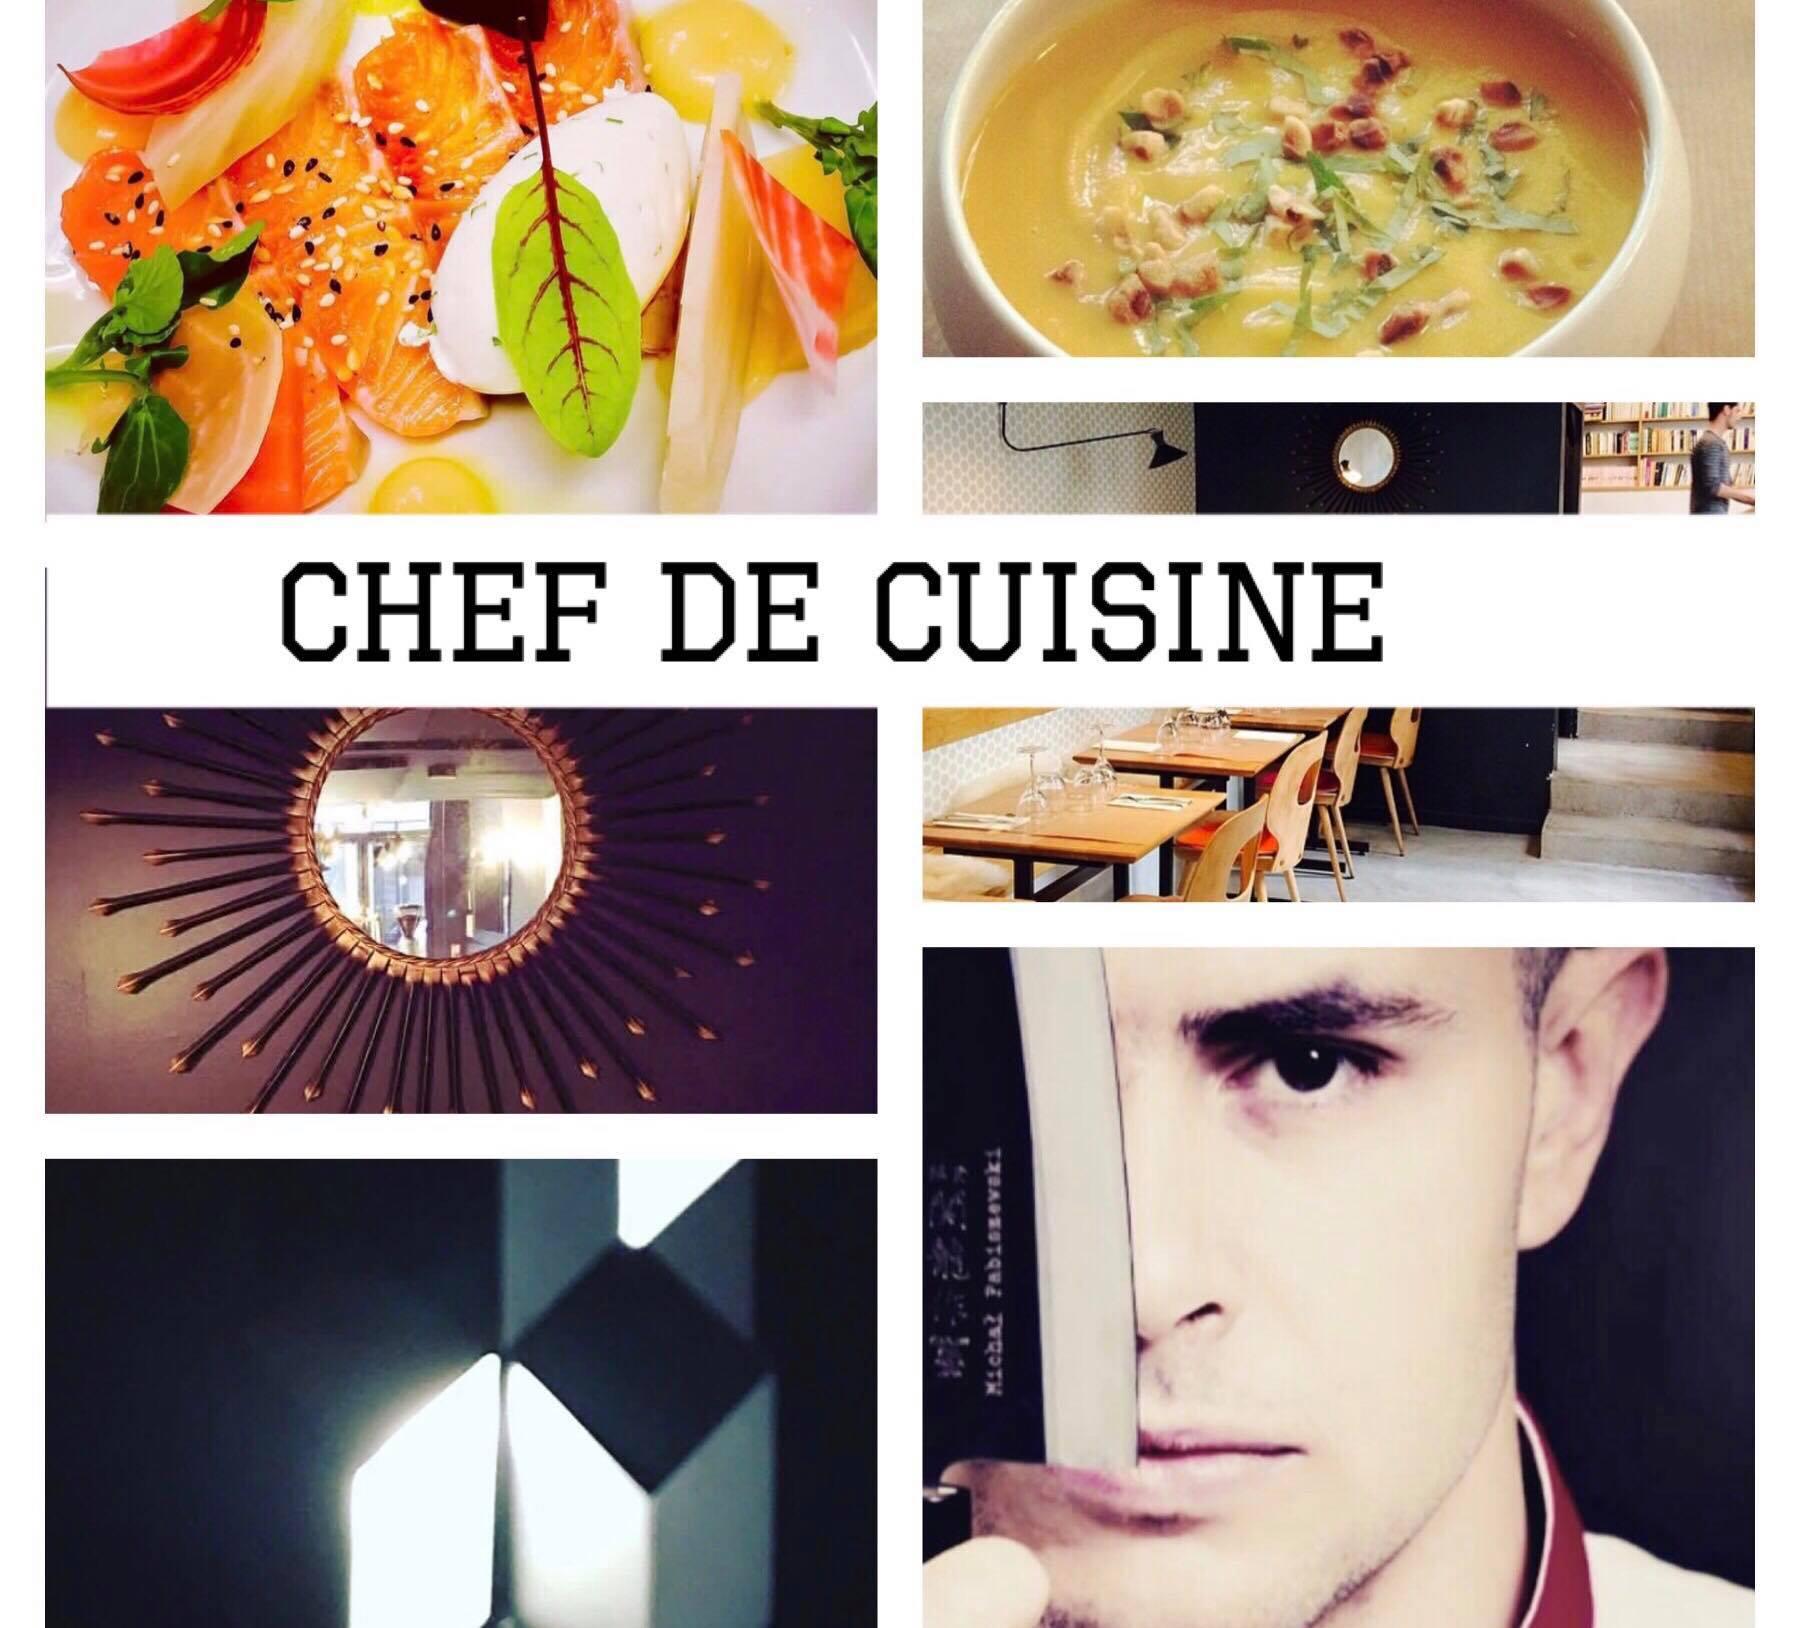 Chef de cuisine rhea recrutement - Recherche chef de cuisine paris ...